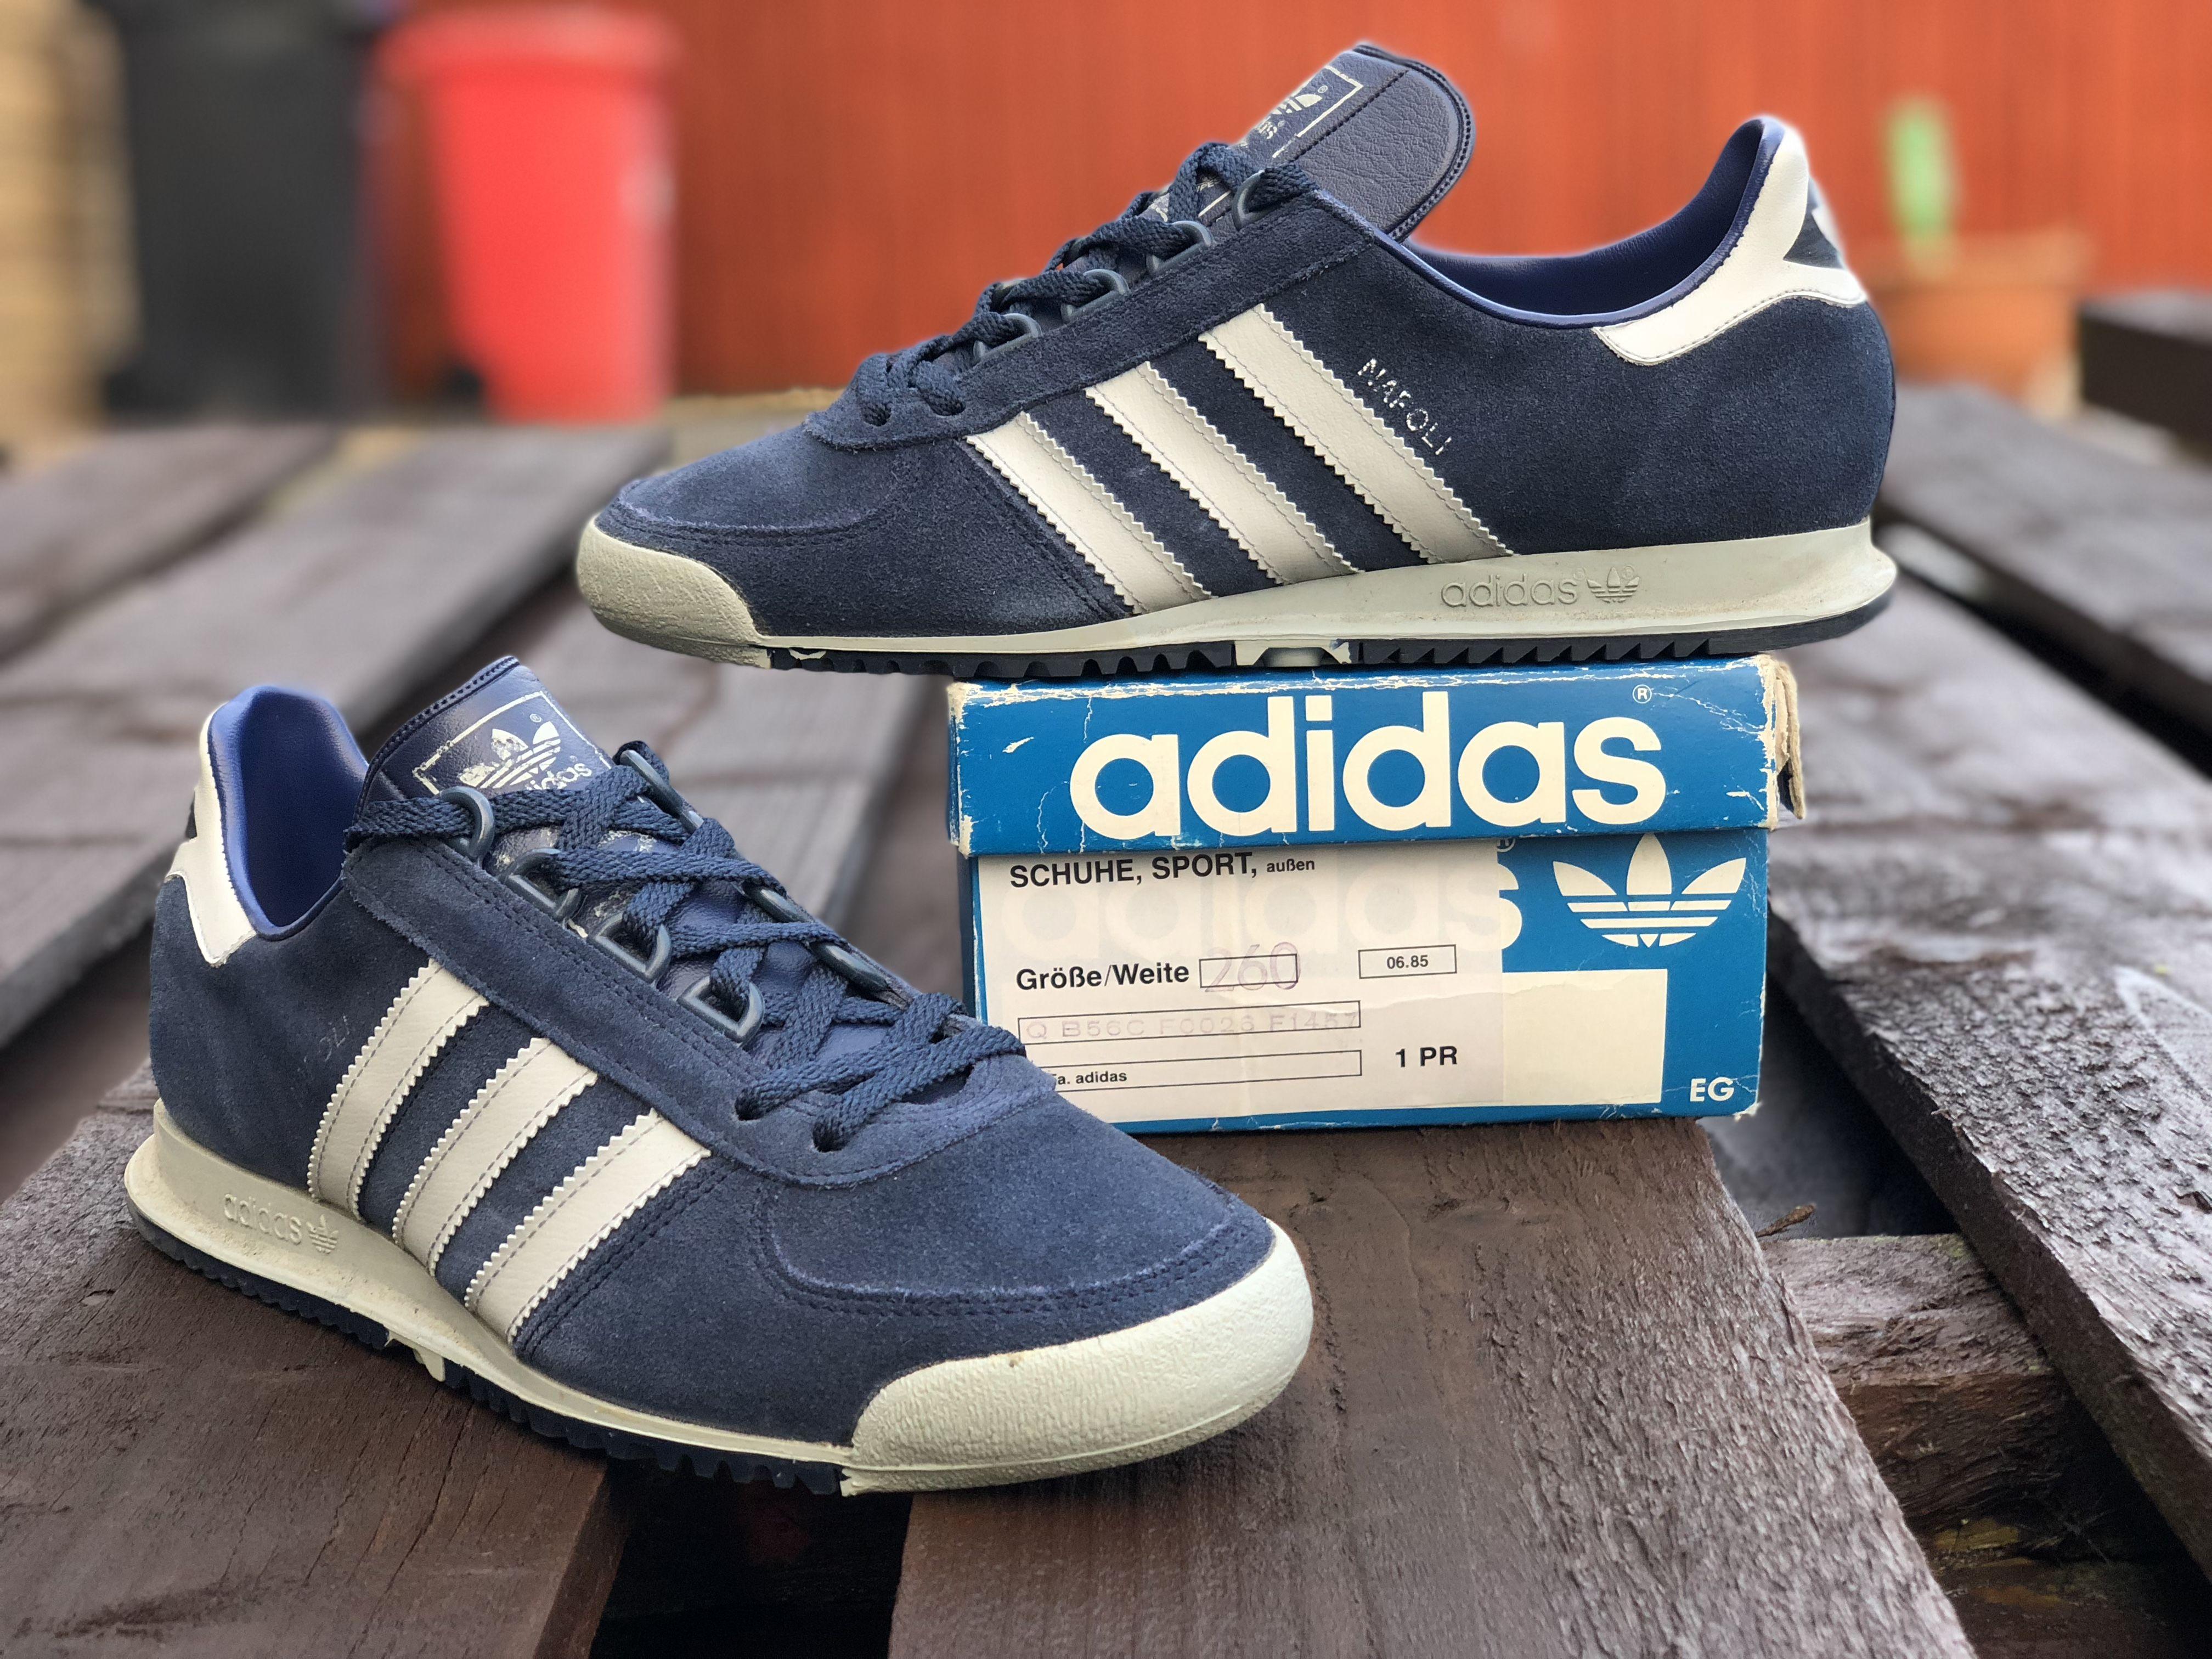 Adidas Napoli | Adidas, Adidas sneakers, Sneakers